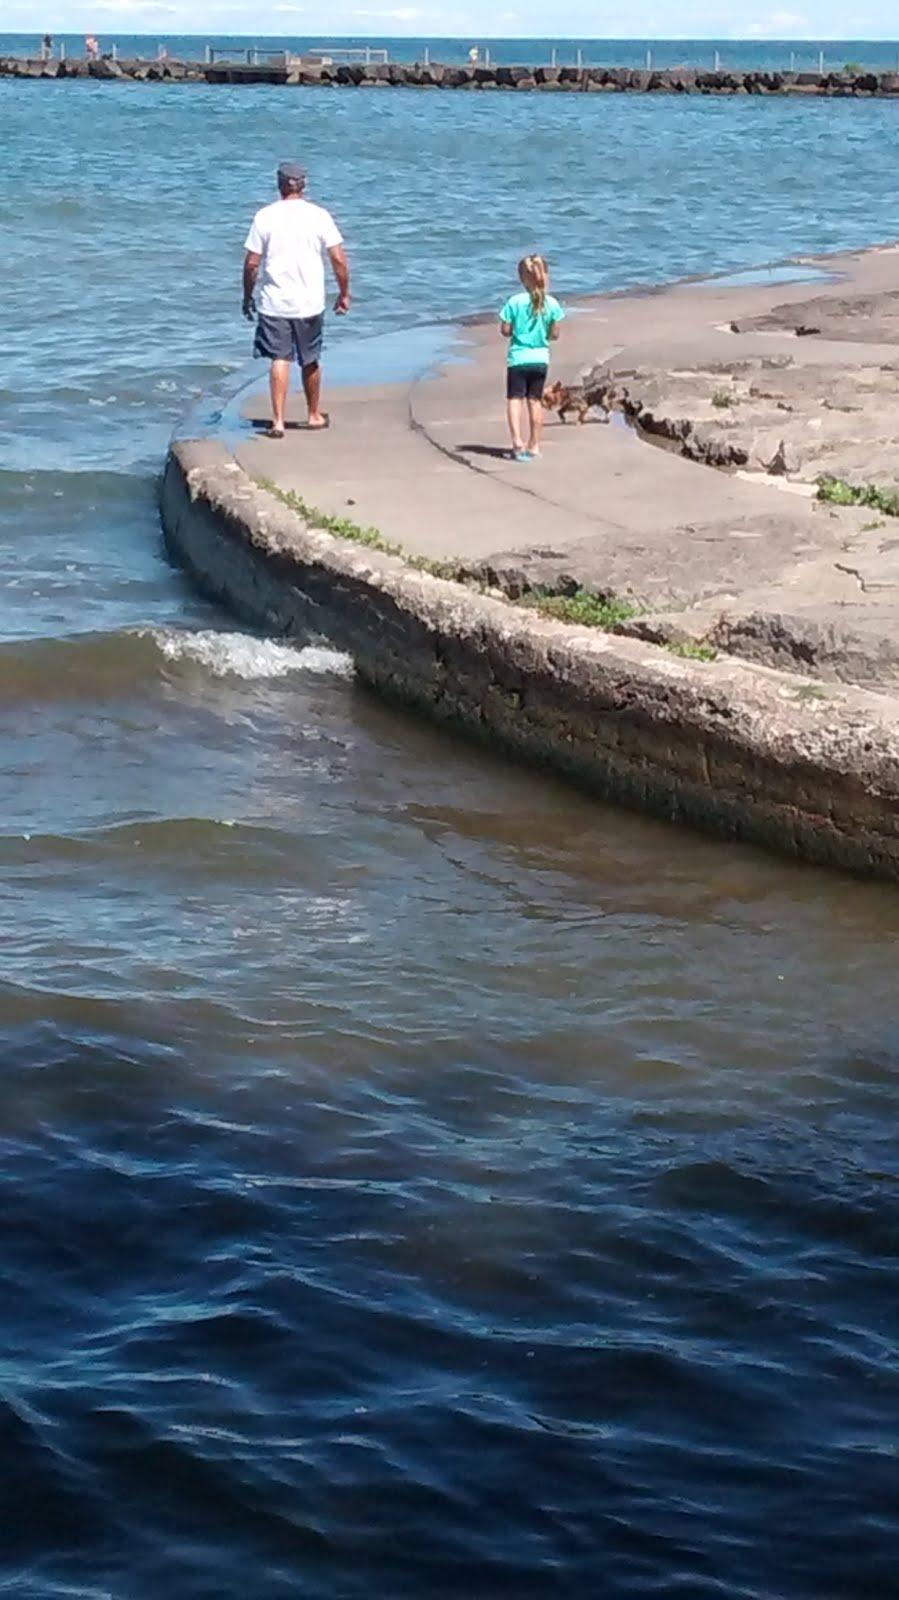 Gotta Love the Water